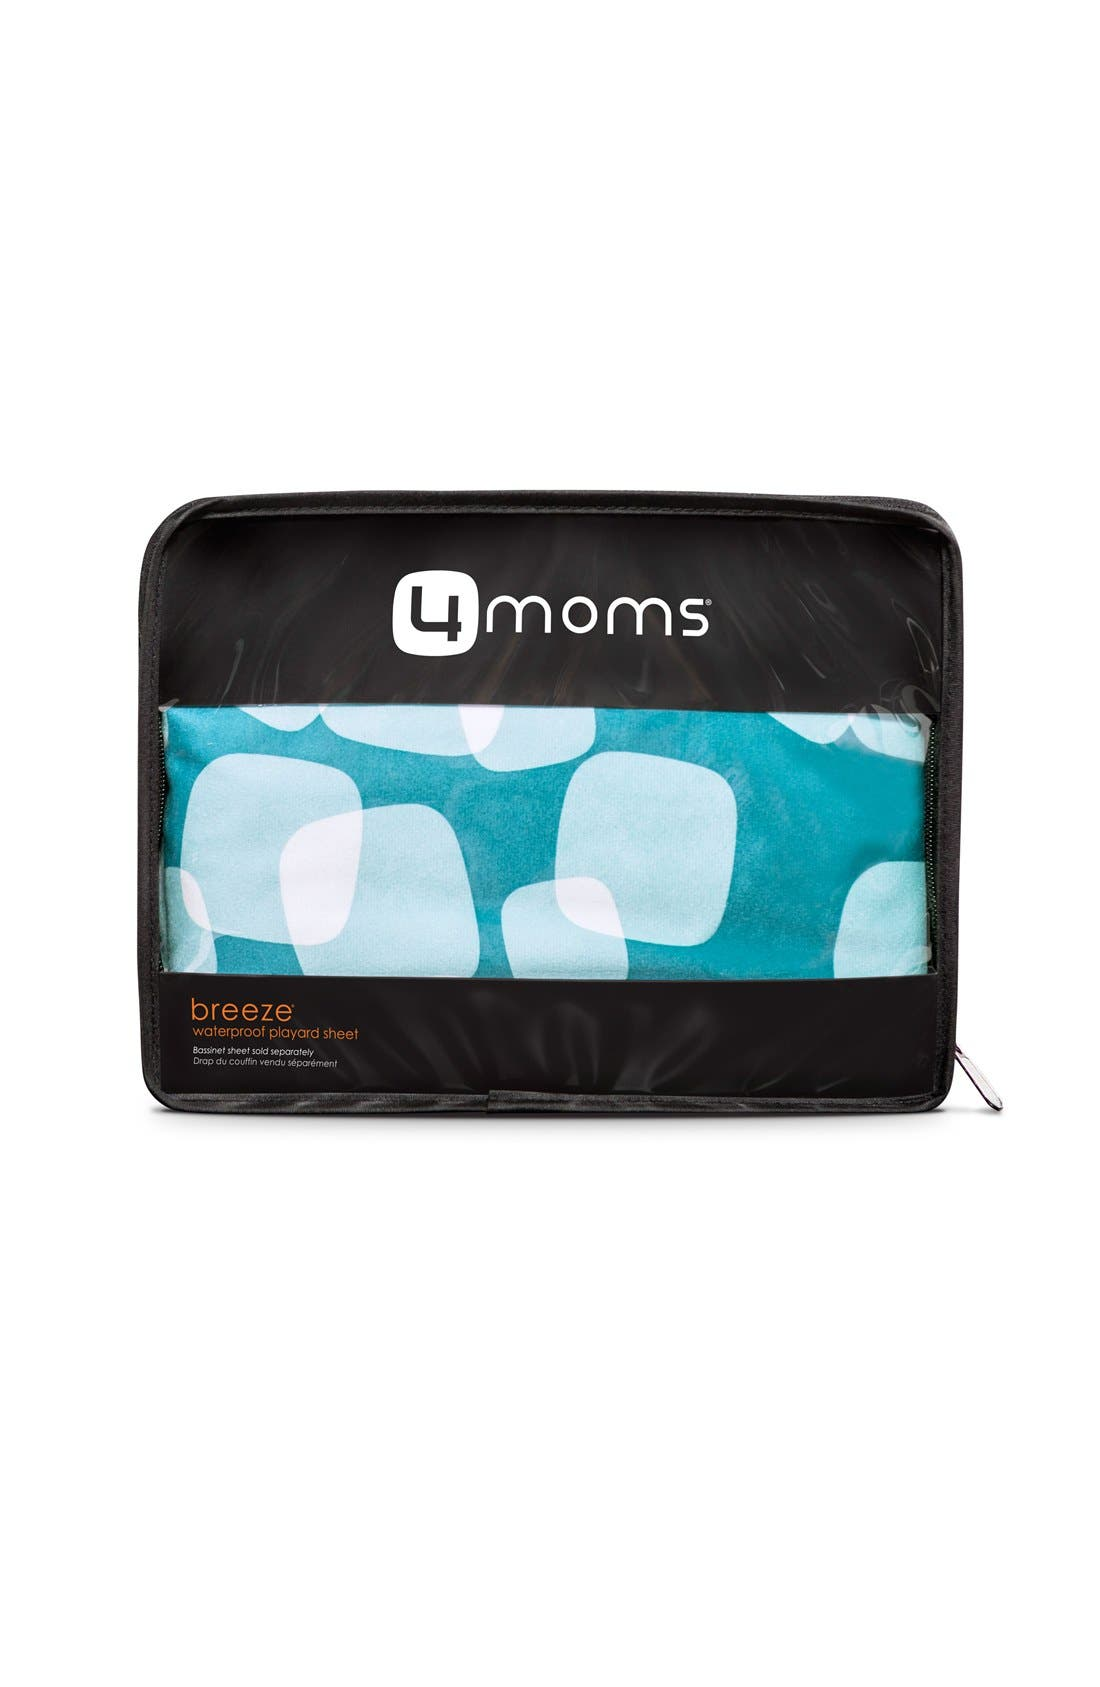 Alternate Image 1 Selected - 4moms 'Breeze' Waterproof Playard Sheet